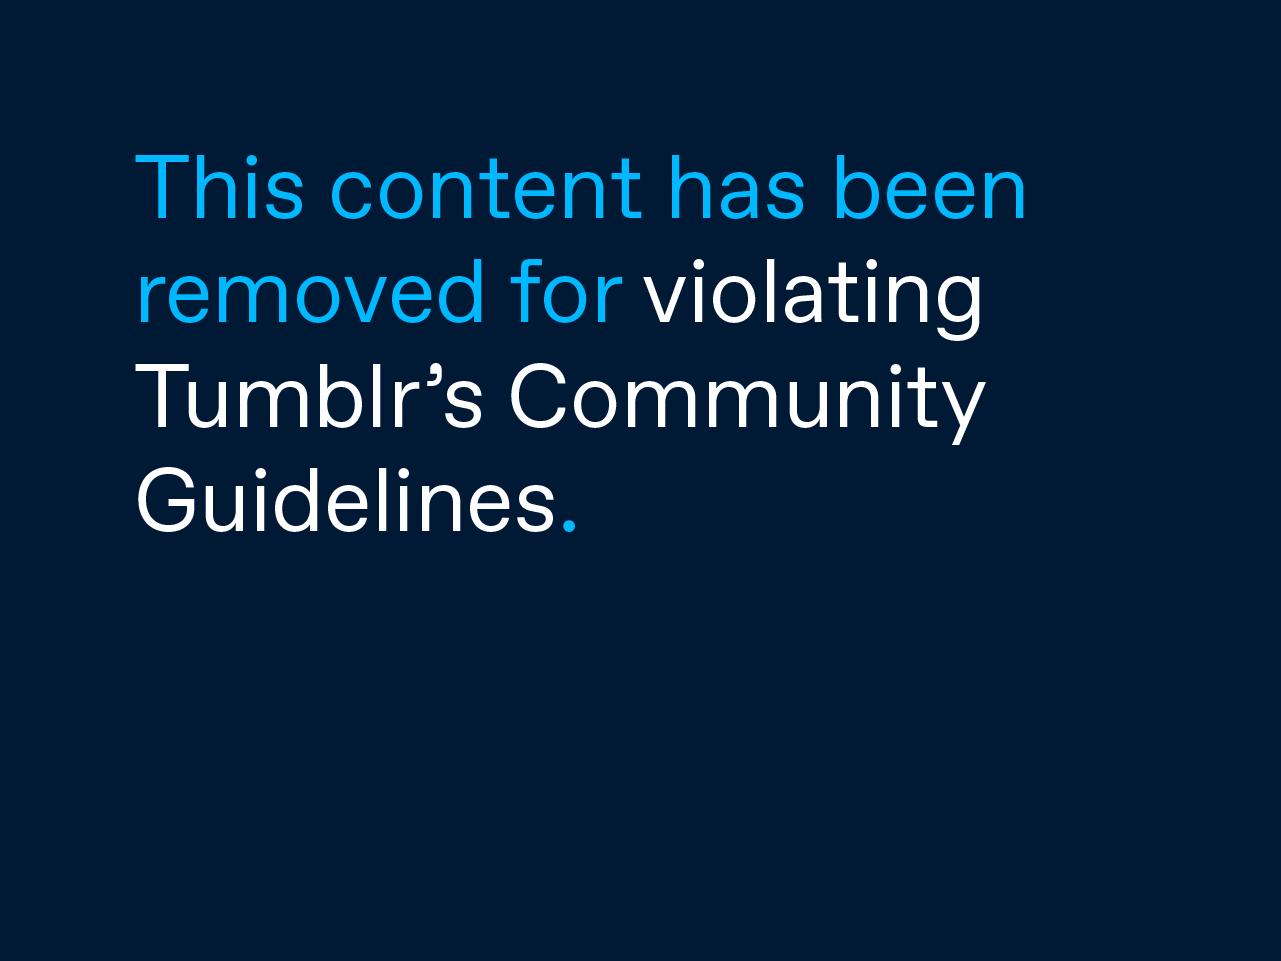 Laurence Koe, Sappho. Öl auf Leinwand, 103 cm x 27,5 cm, Bonhams, London